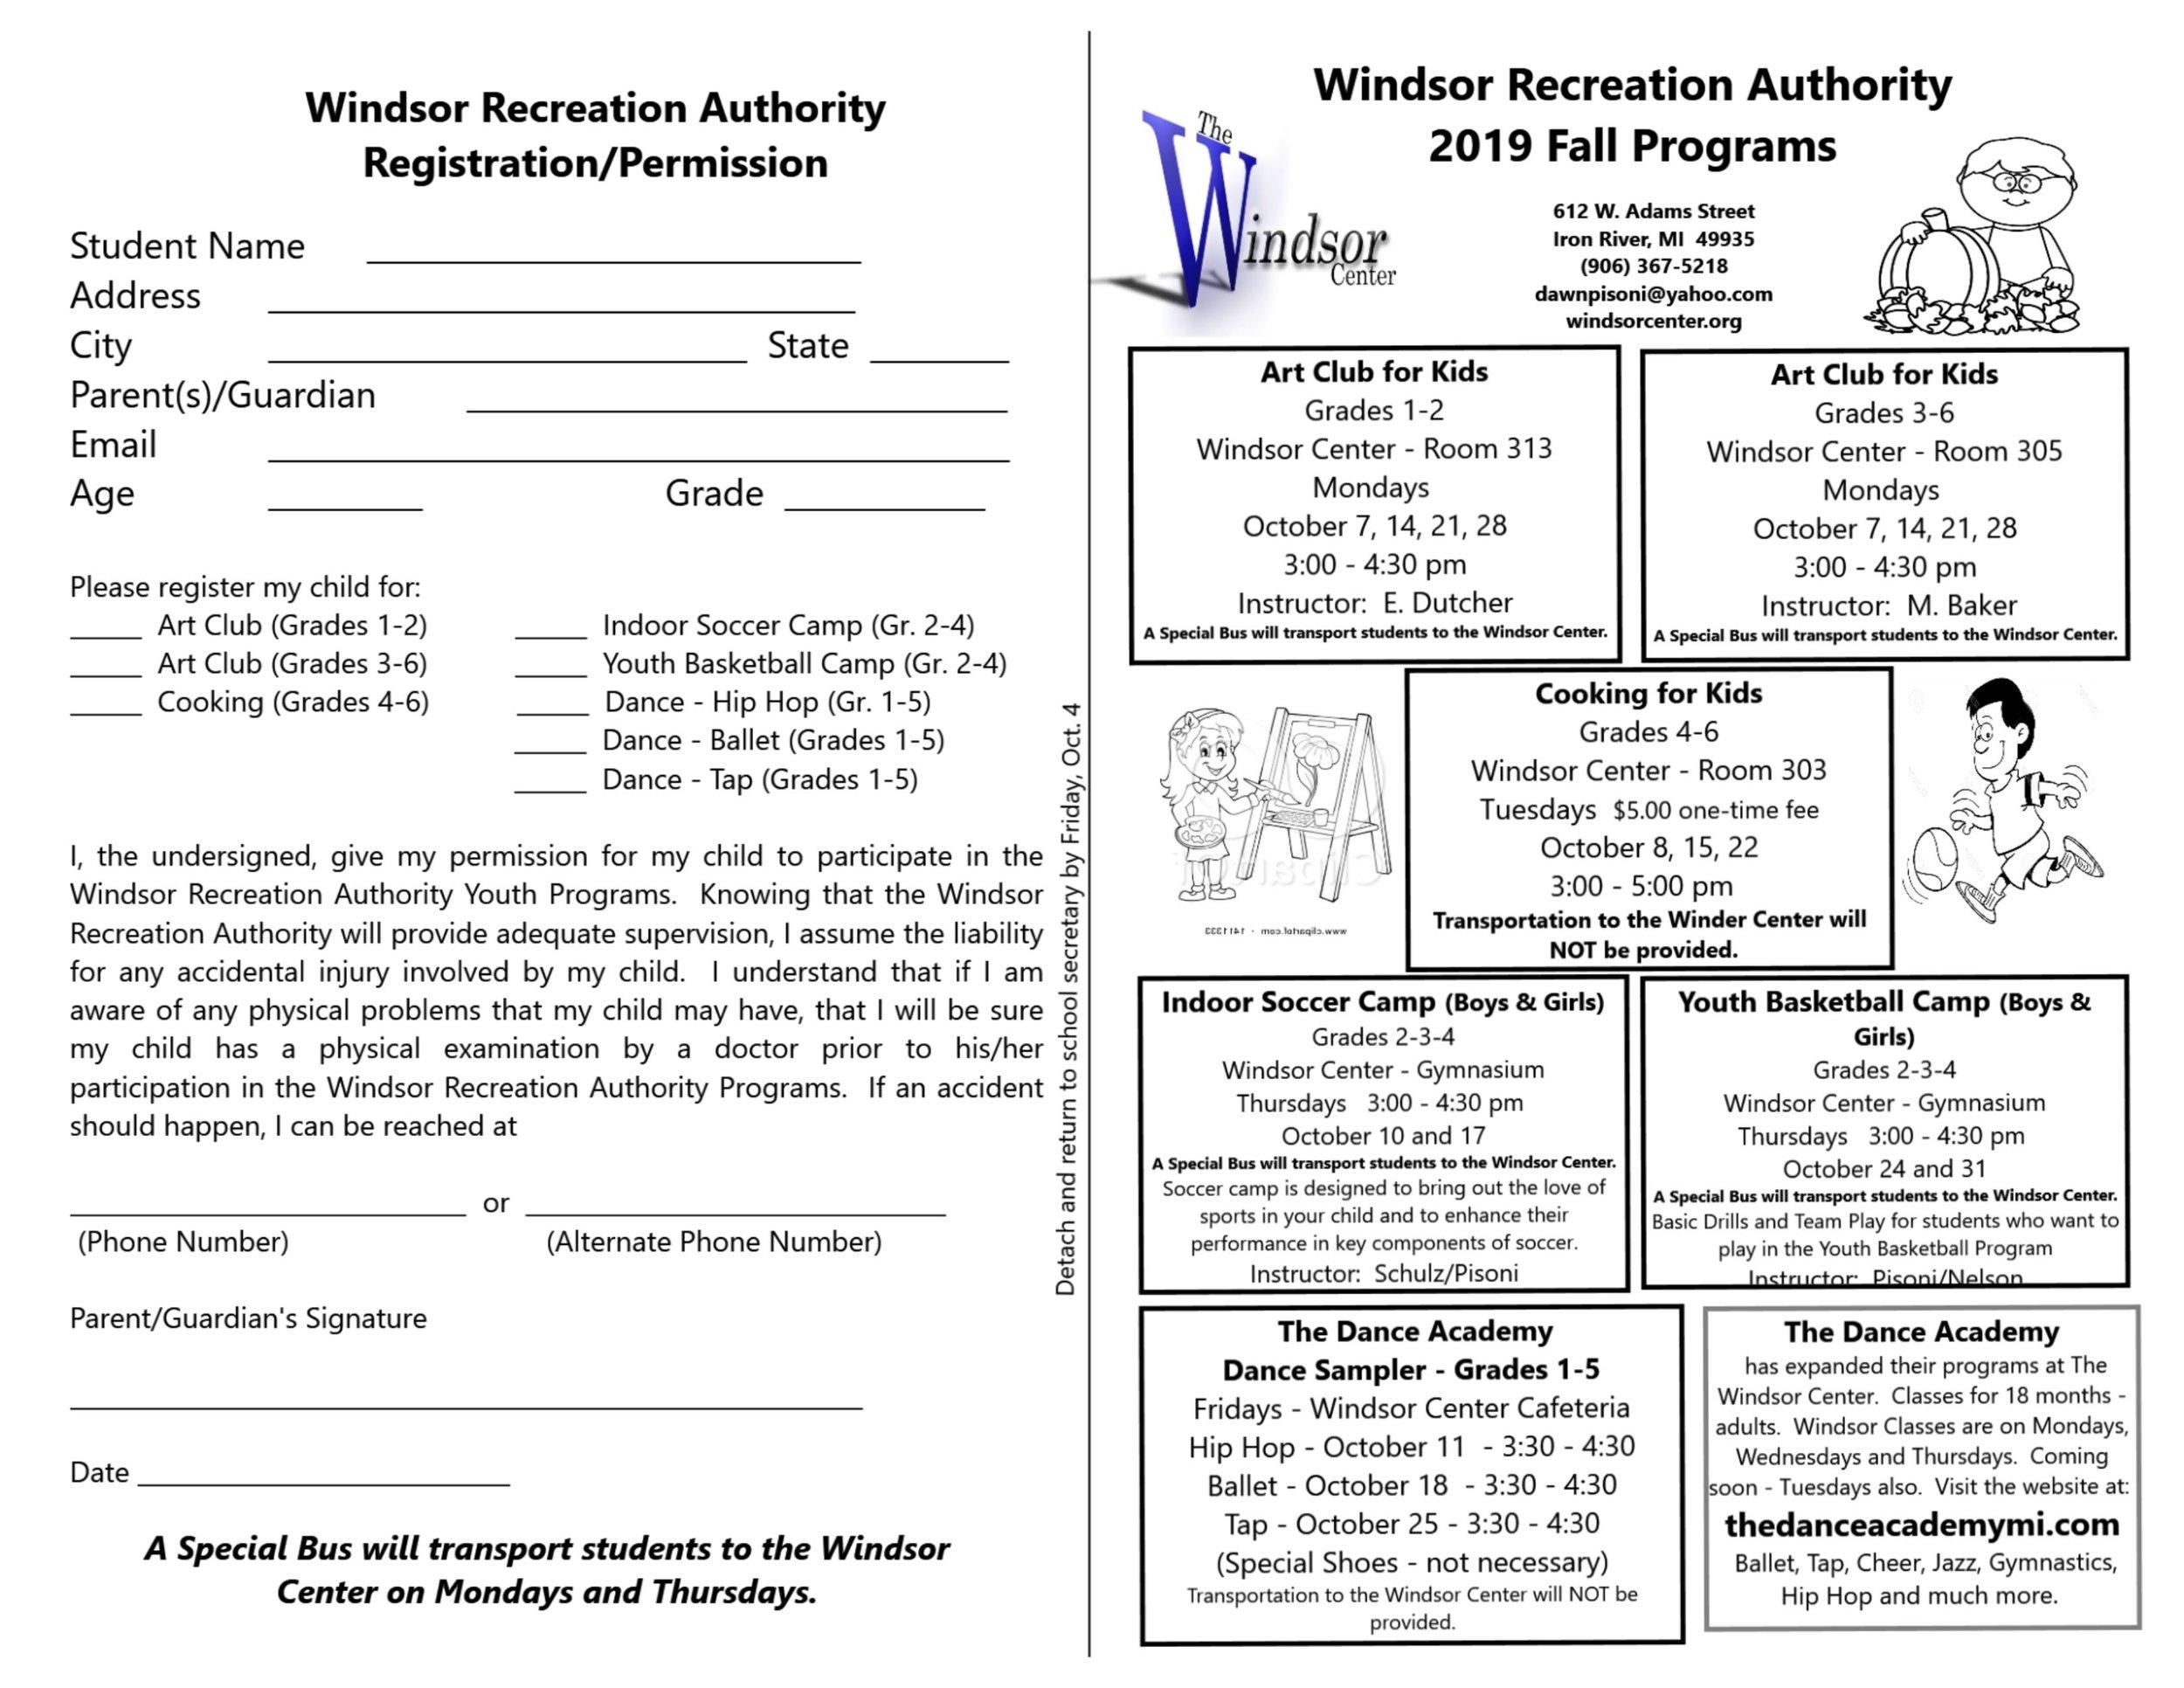 Fall 2019 Programs flyer-page1.jpg